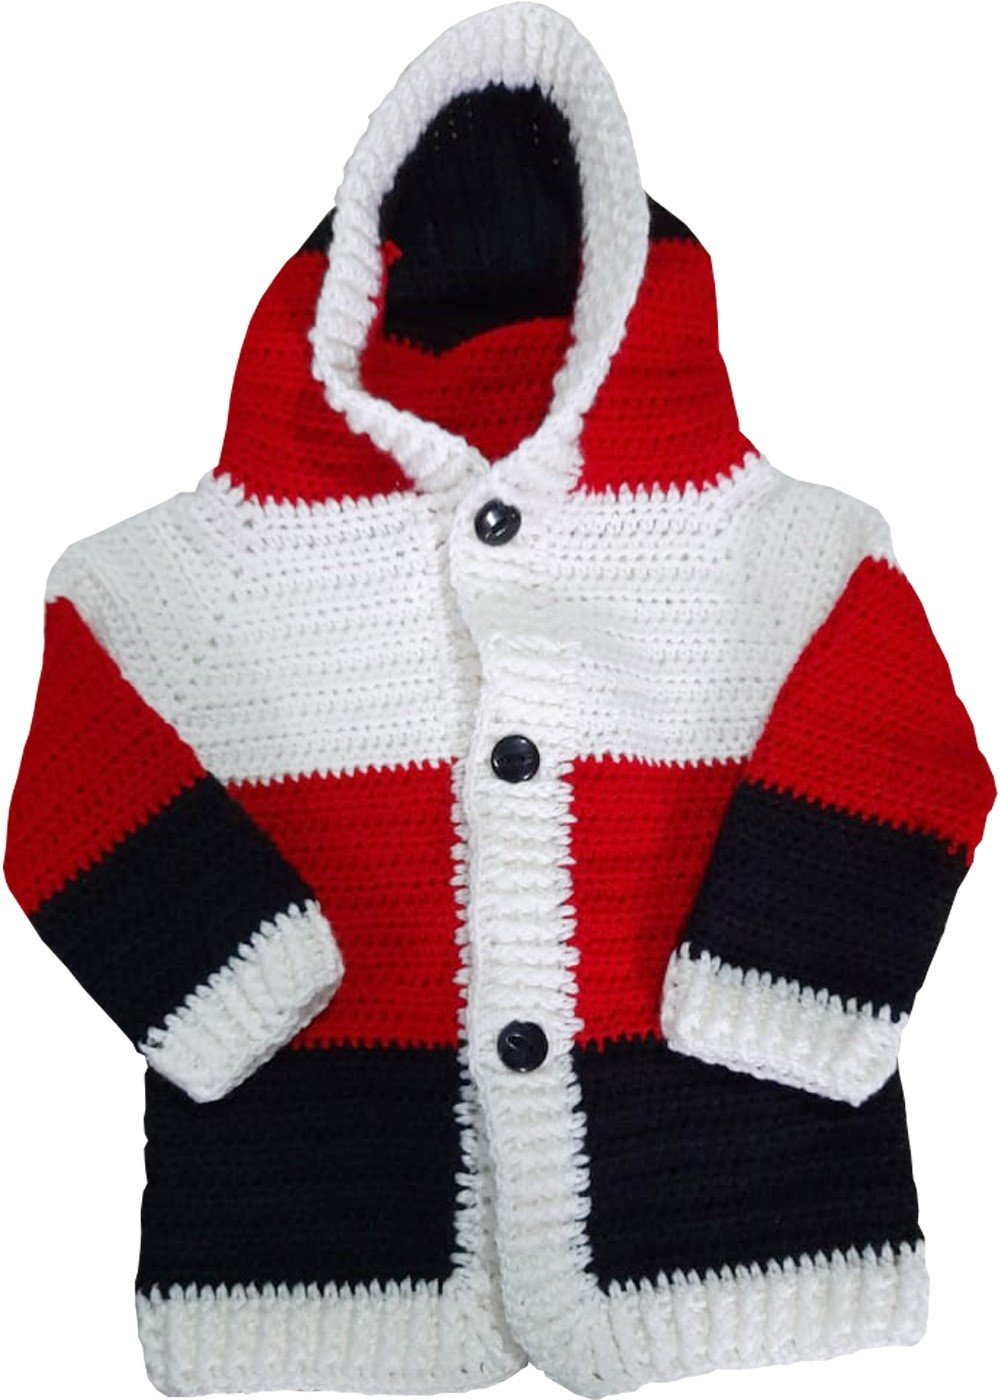 Hand Crochet Multicoloured Fleece